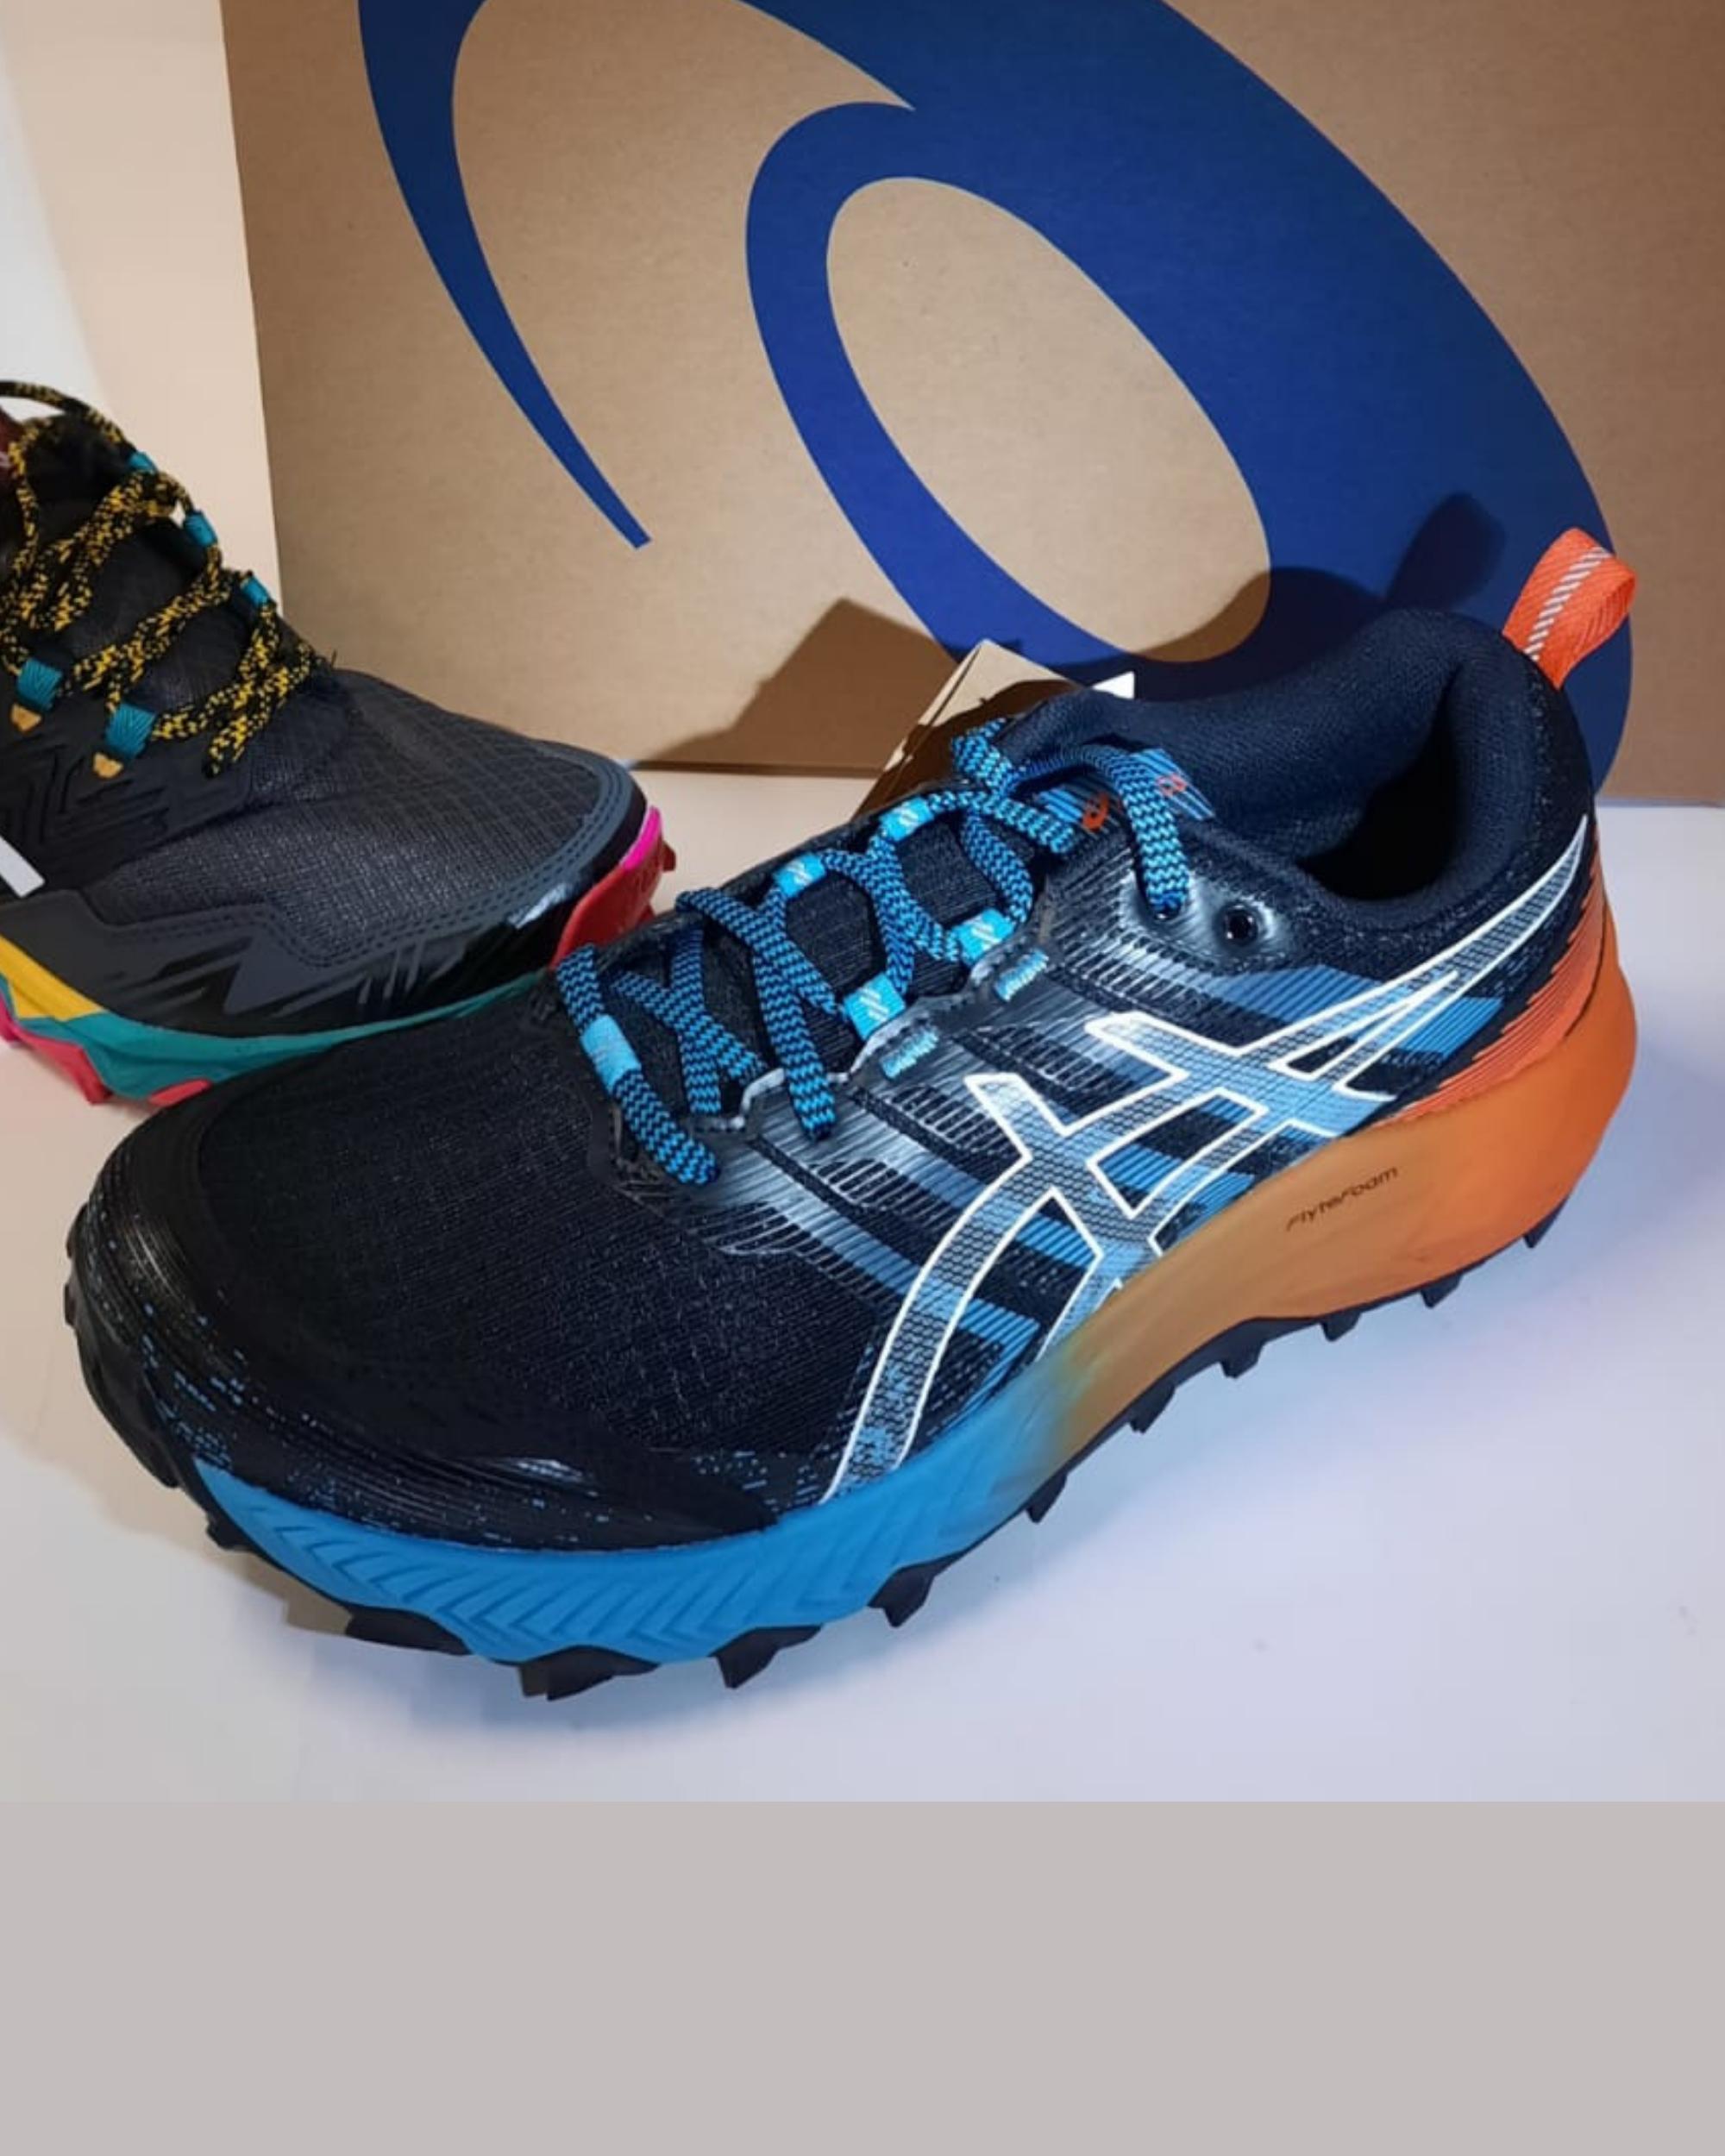 Chaussures ASICS trail homme GEL TRABUCO - Intersport Morzine